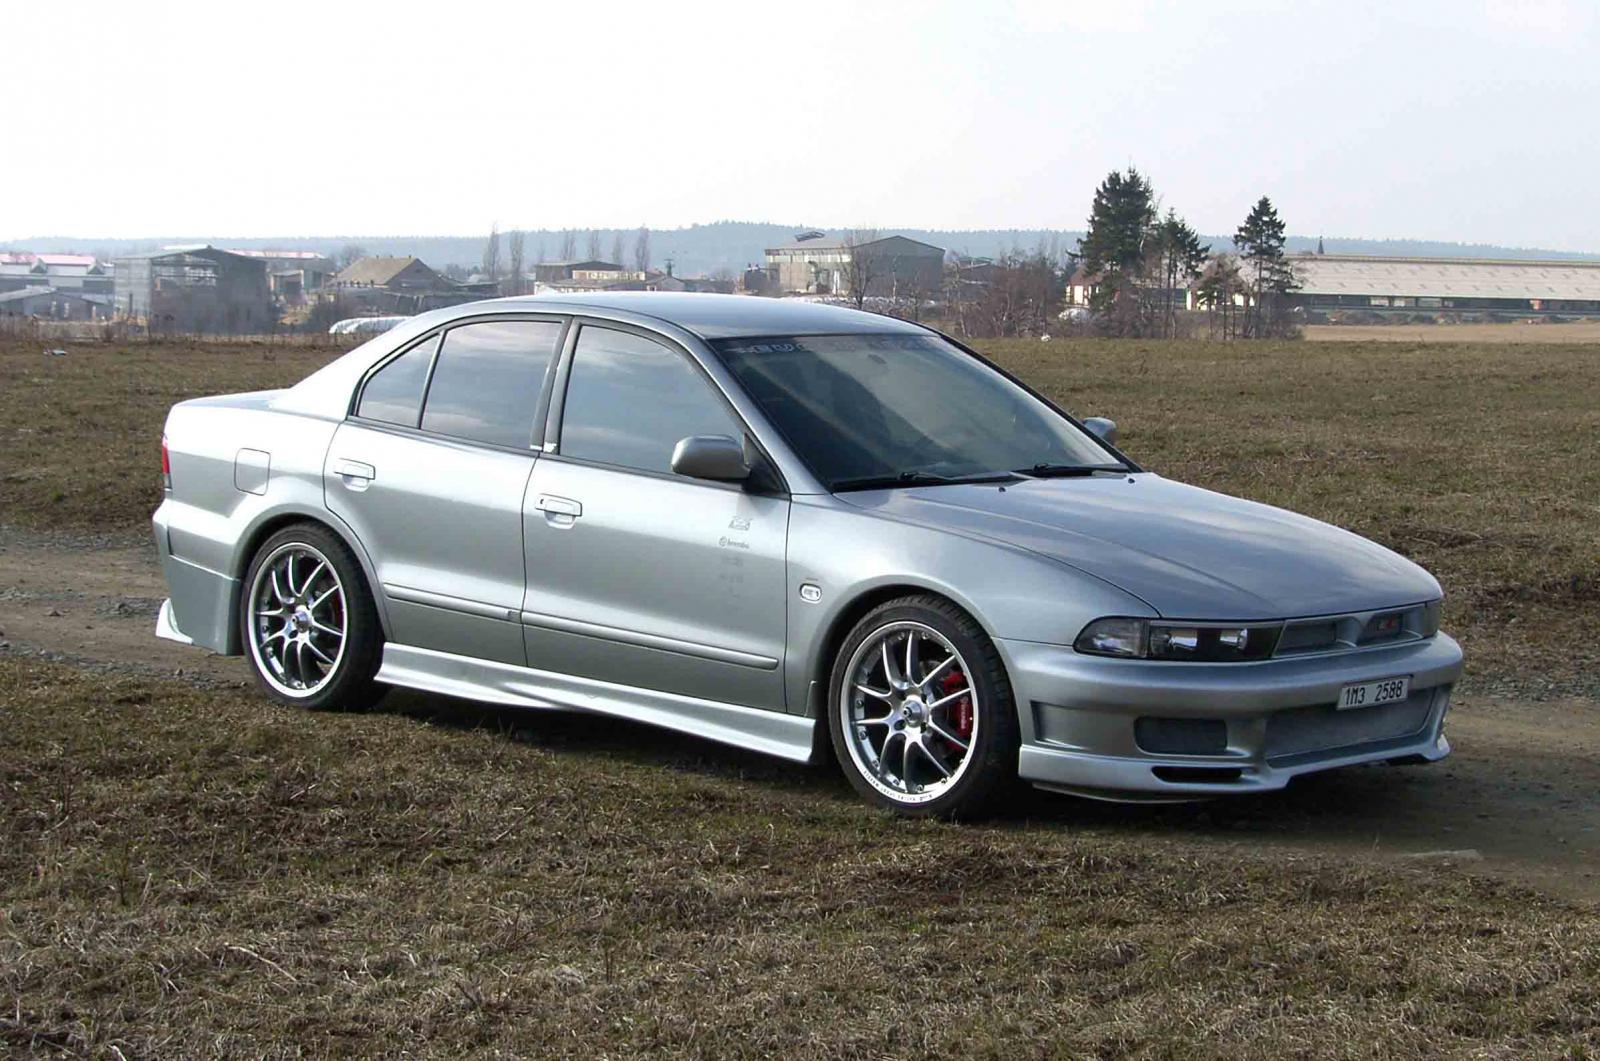 Free Download Mitsubishi Galant 25 V6 Wallpaper 46062